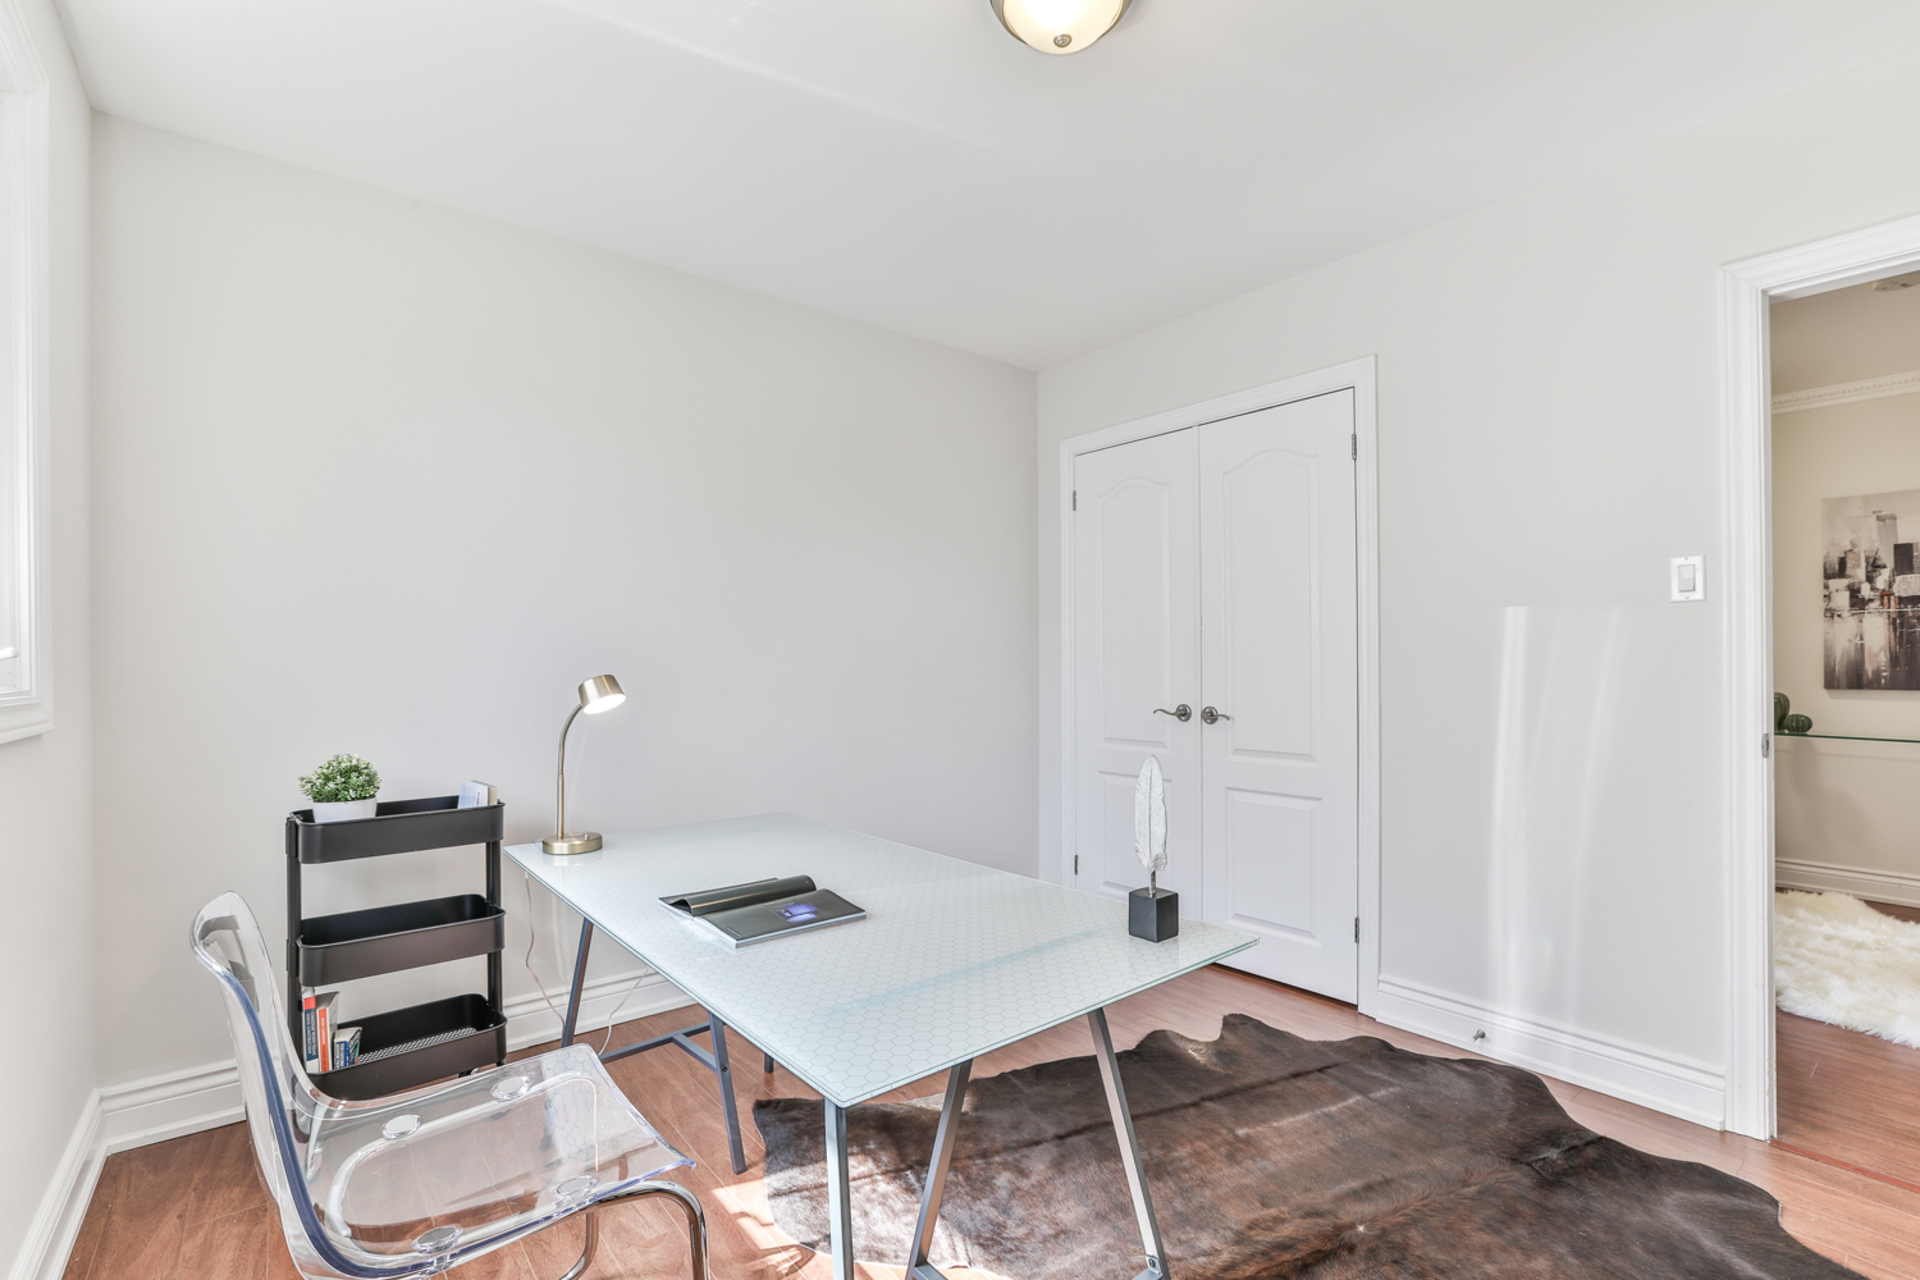 Bedroom at 111 Bannatyne Drive, St. Andrew-Windfields, Toronto